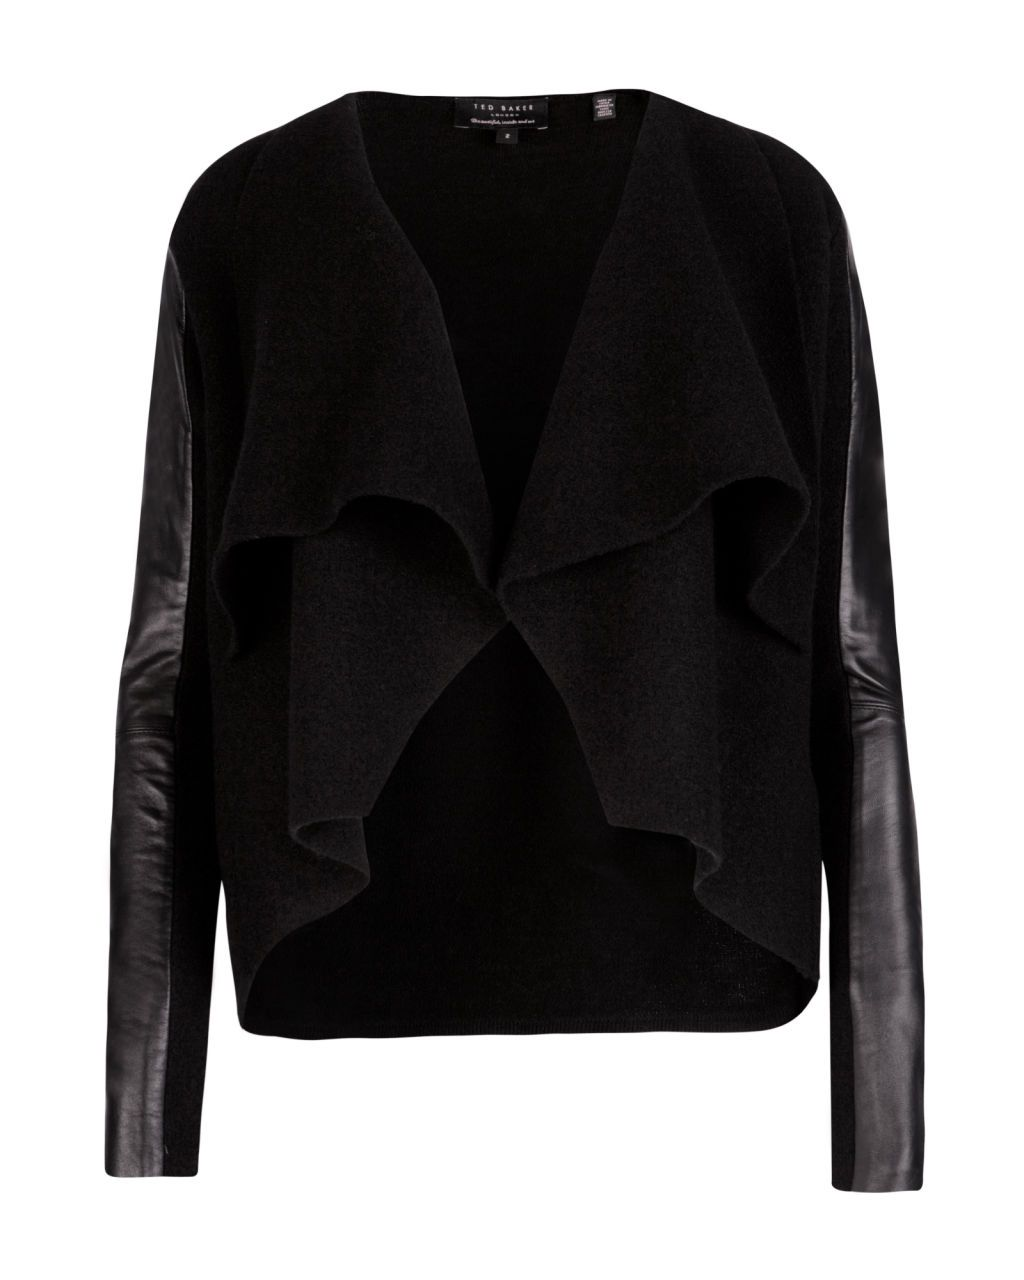 Leather trim wrap - Black | Knitwear | Ted Baker UK - sheer panel ...